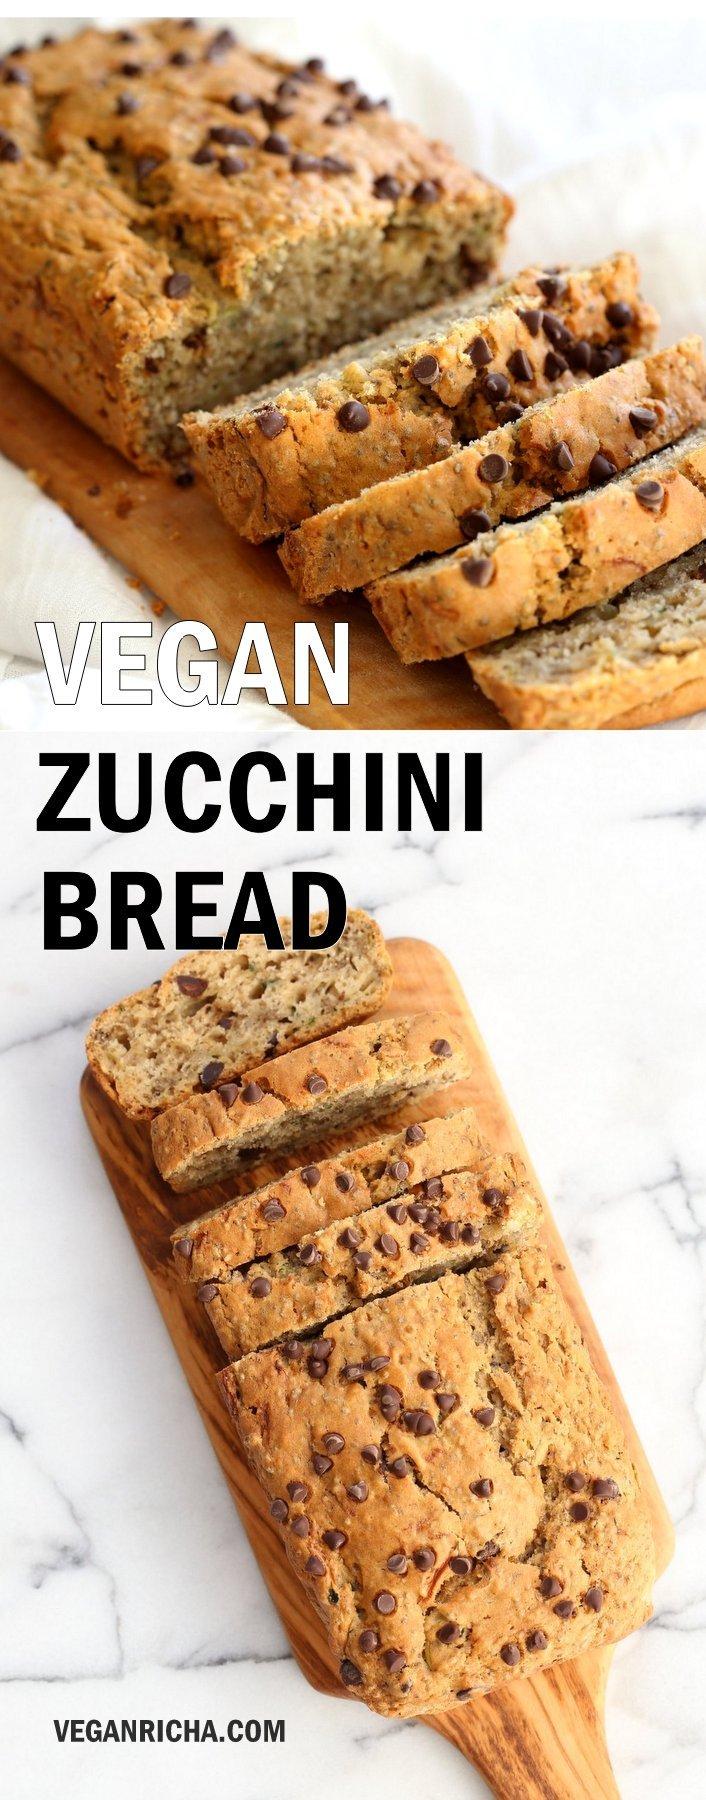 Easy Vegan Zucchini Bread #veganricha